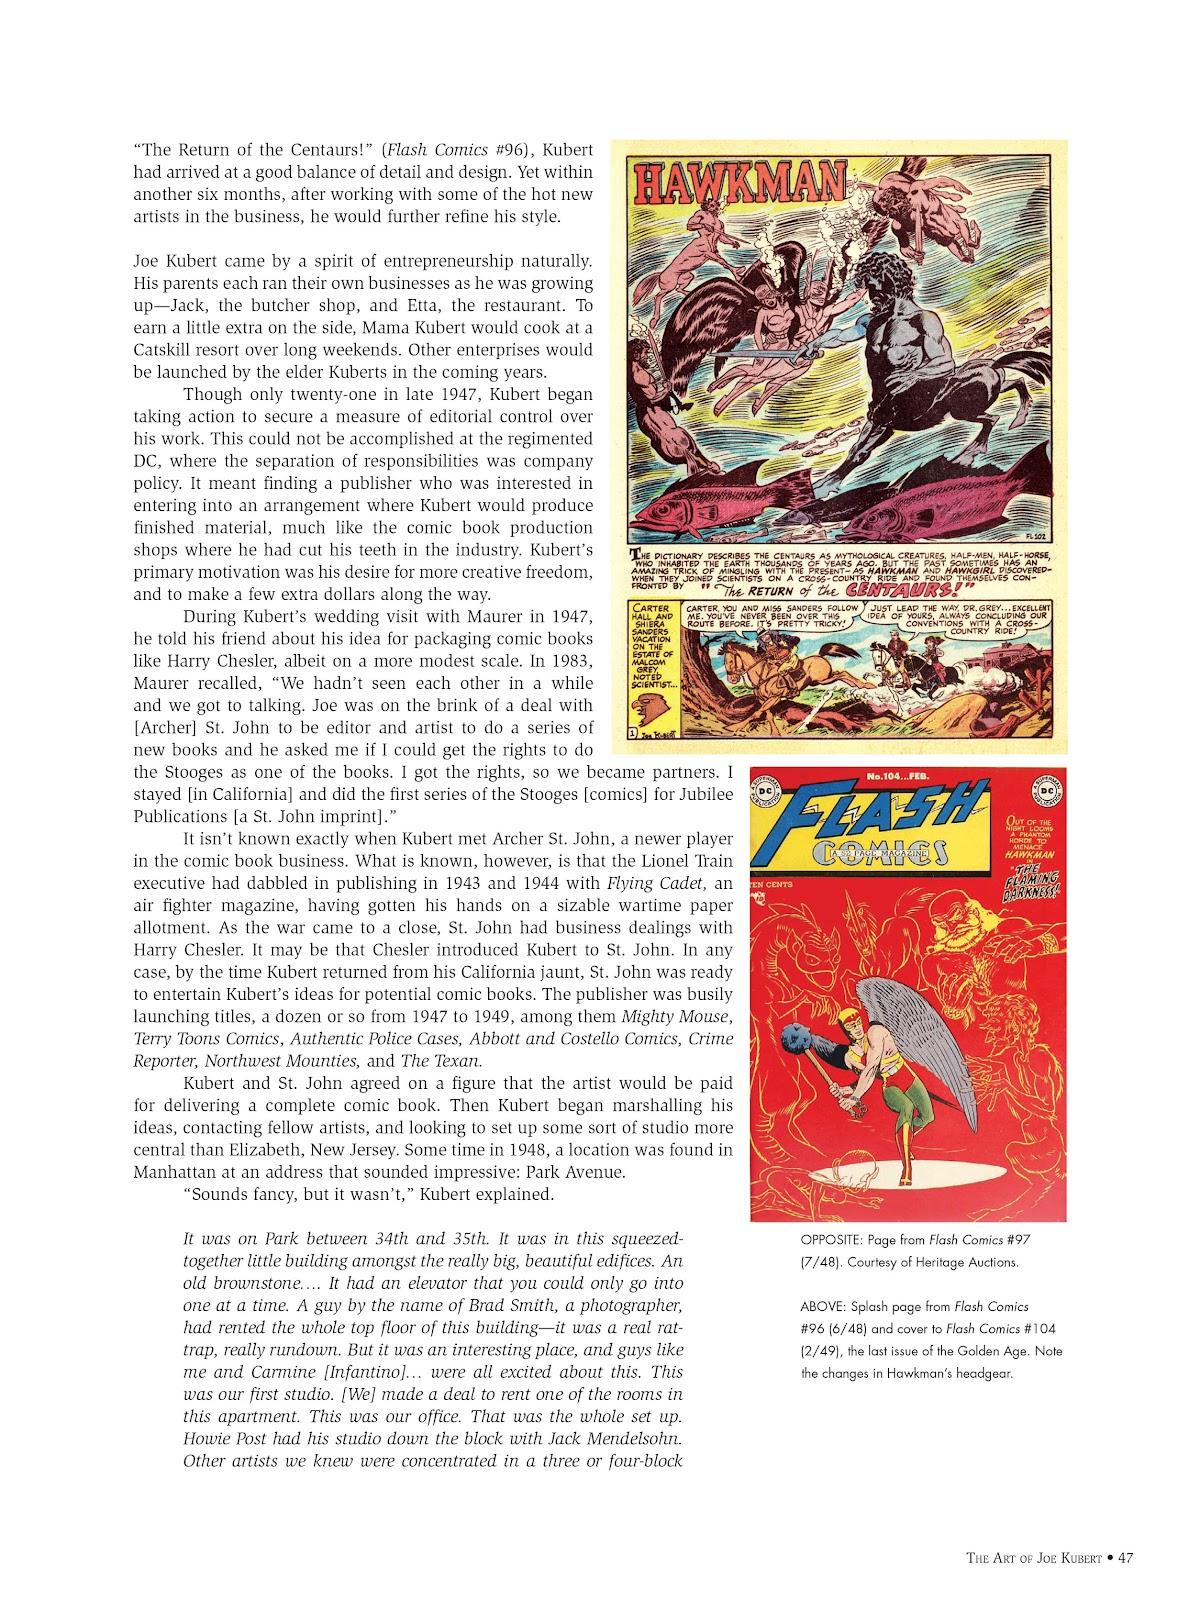 Read online The Art of Joe Kubert comic -  Issue # TPB (Part 1) - 46